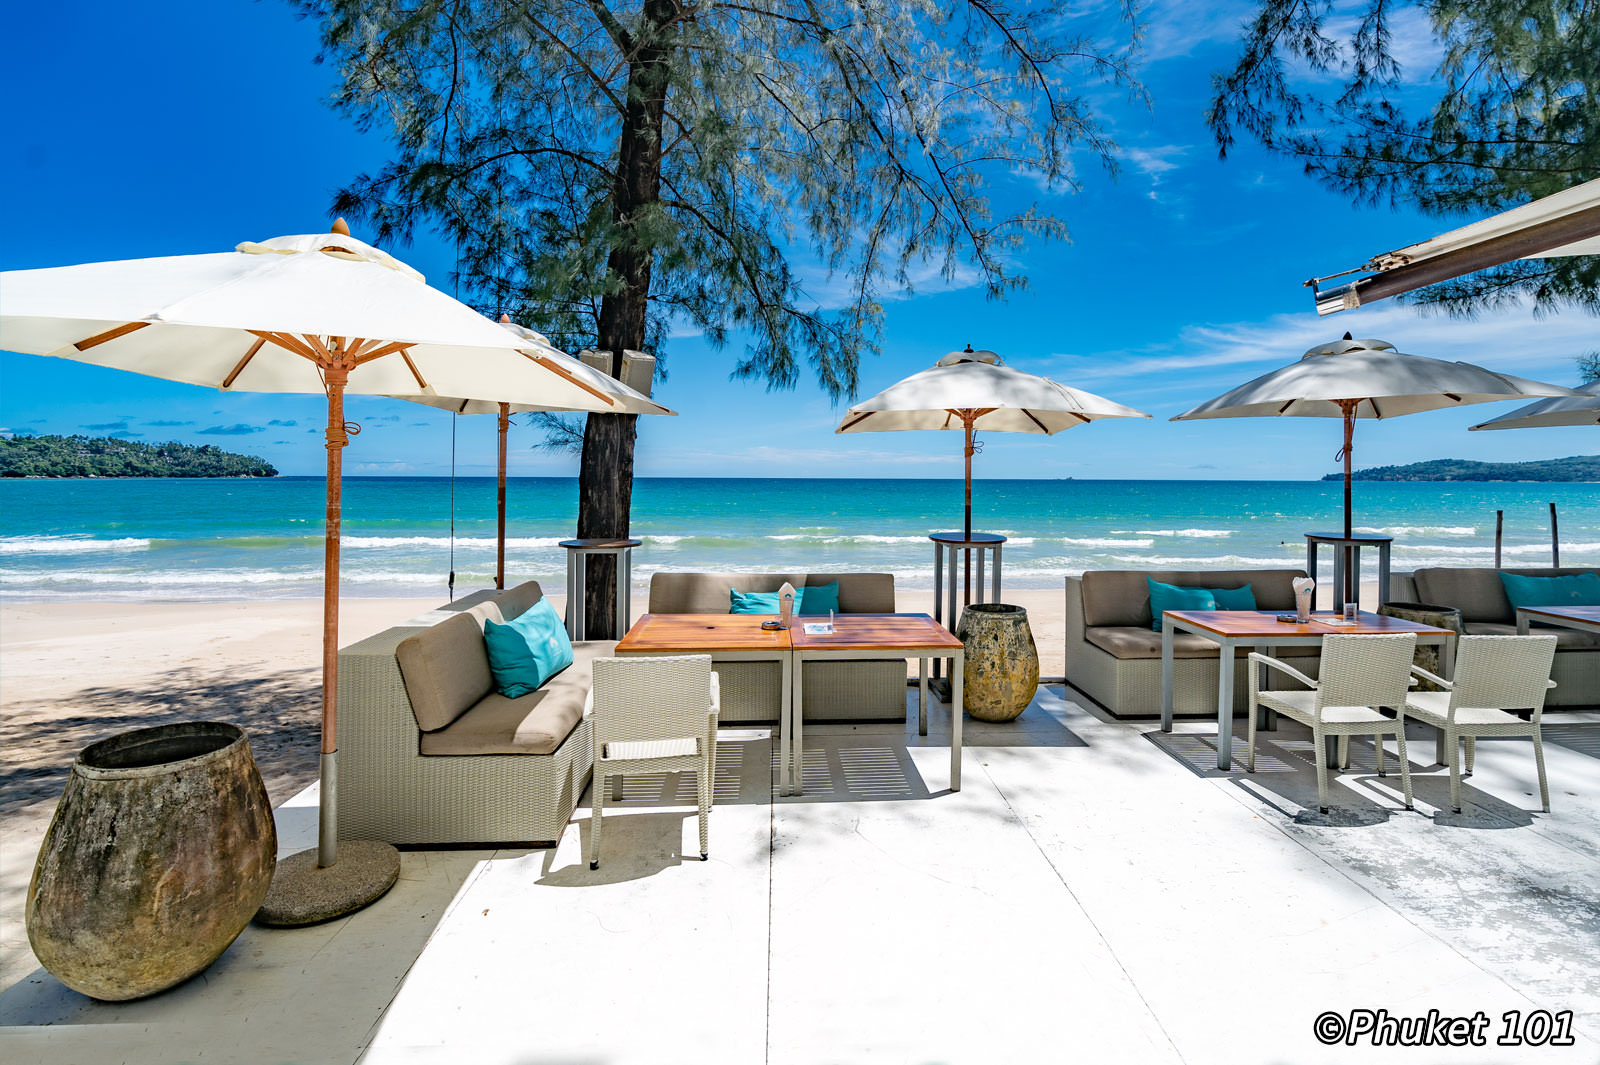 Best Beach Clubs in Phuket